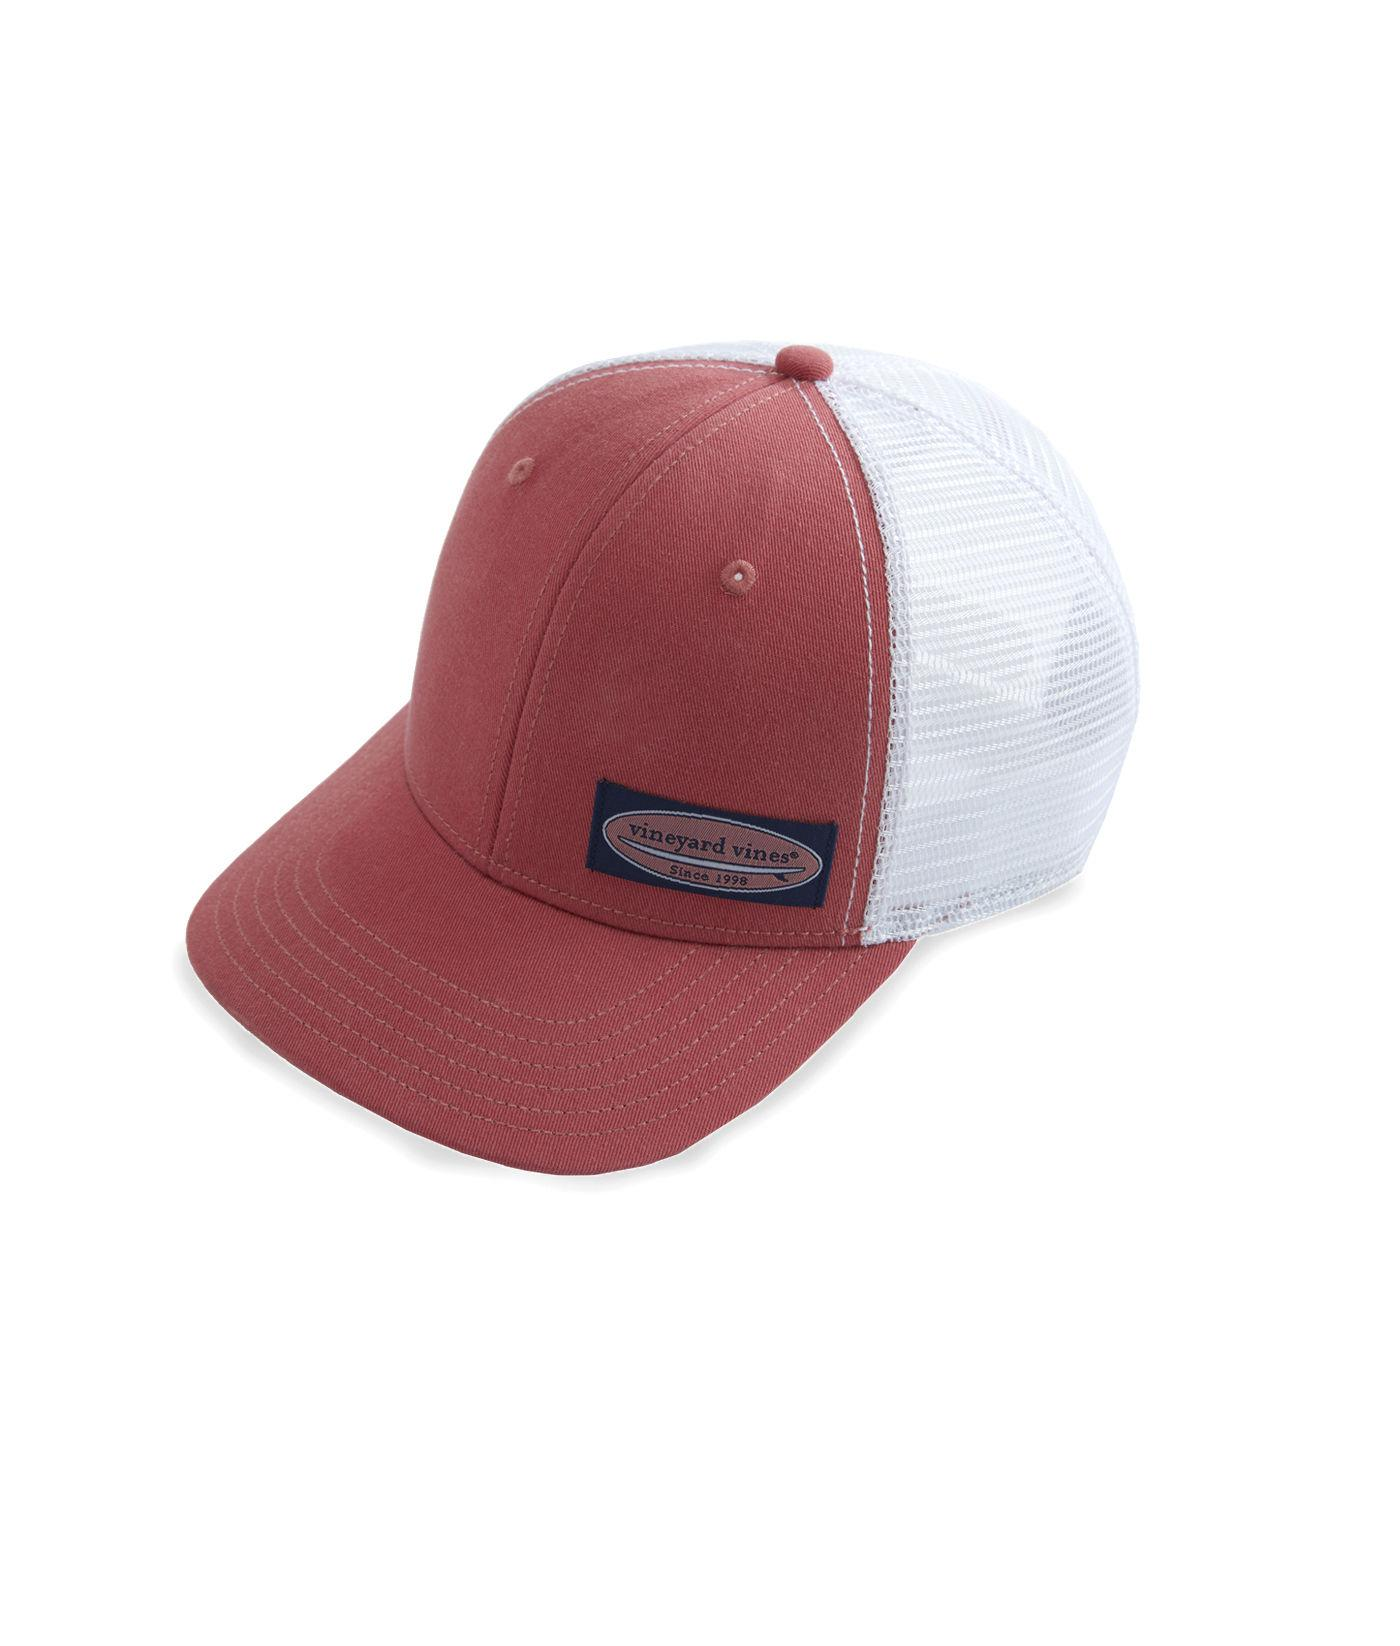 790d410b54d Lyst - Vineyard Vines High Profile Surf Label Trucker Hat in Red for Men